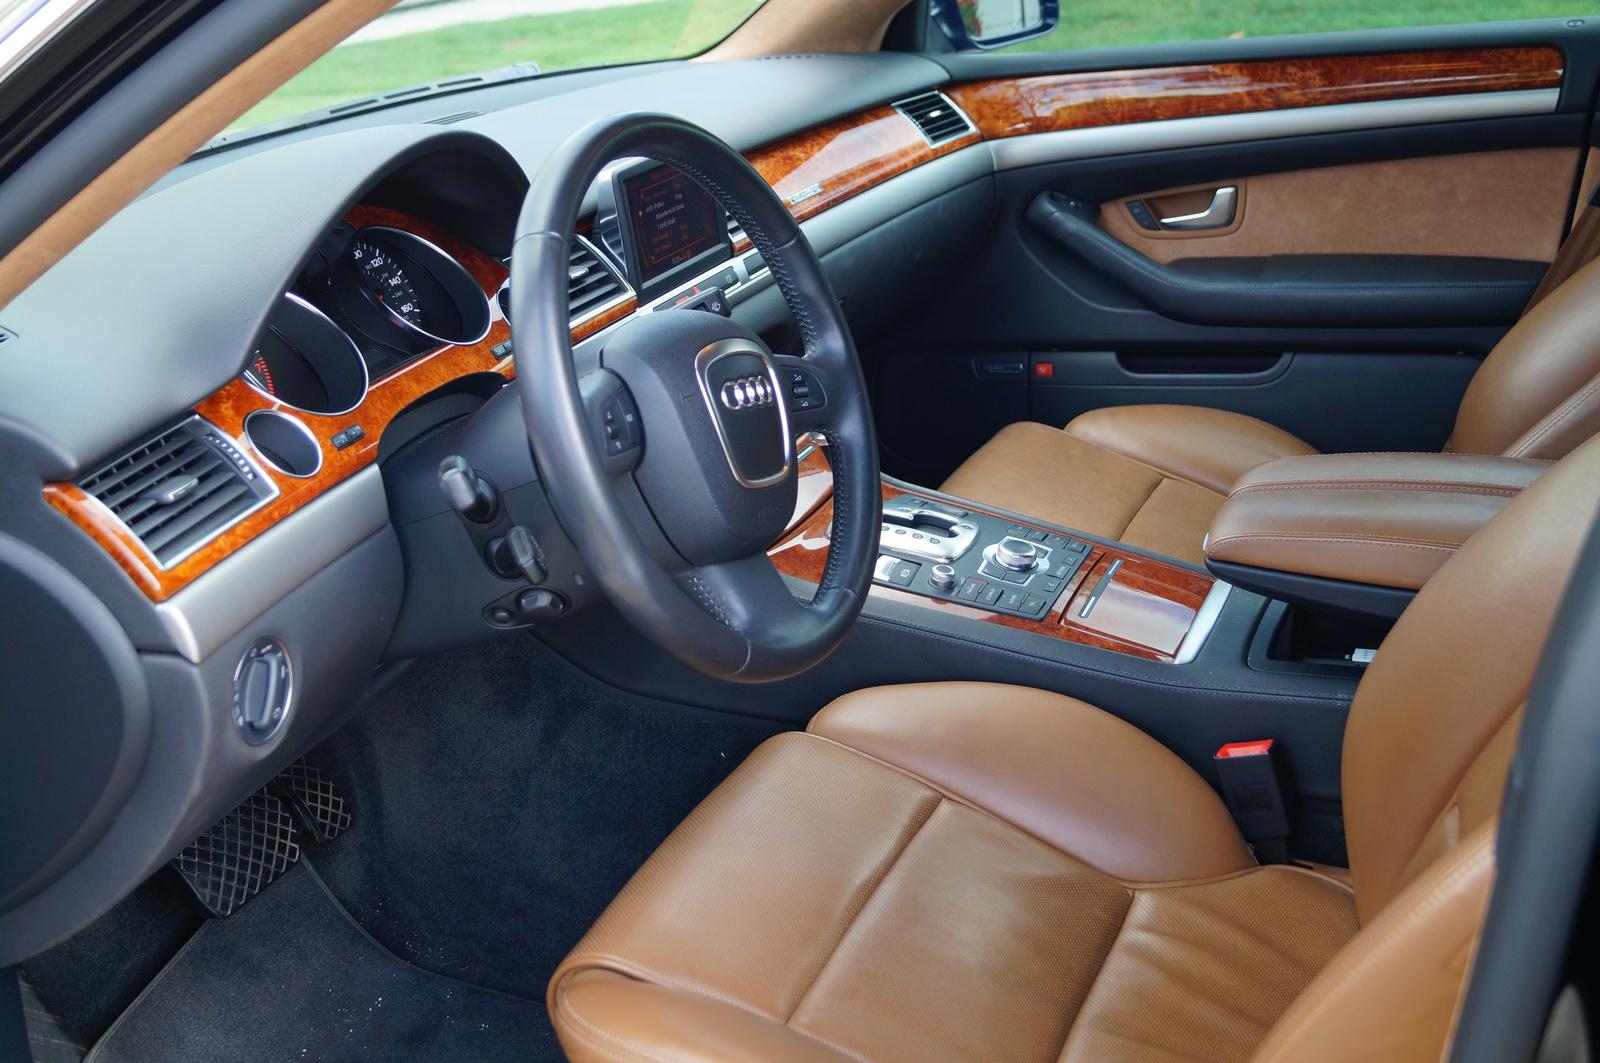 2007 Audi A8 Image 19